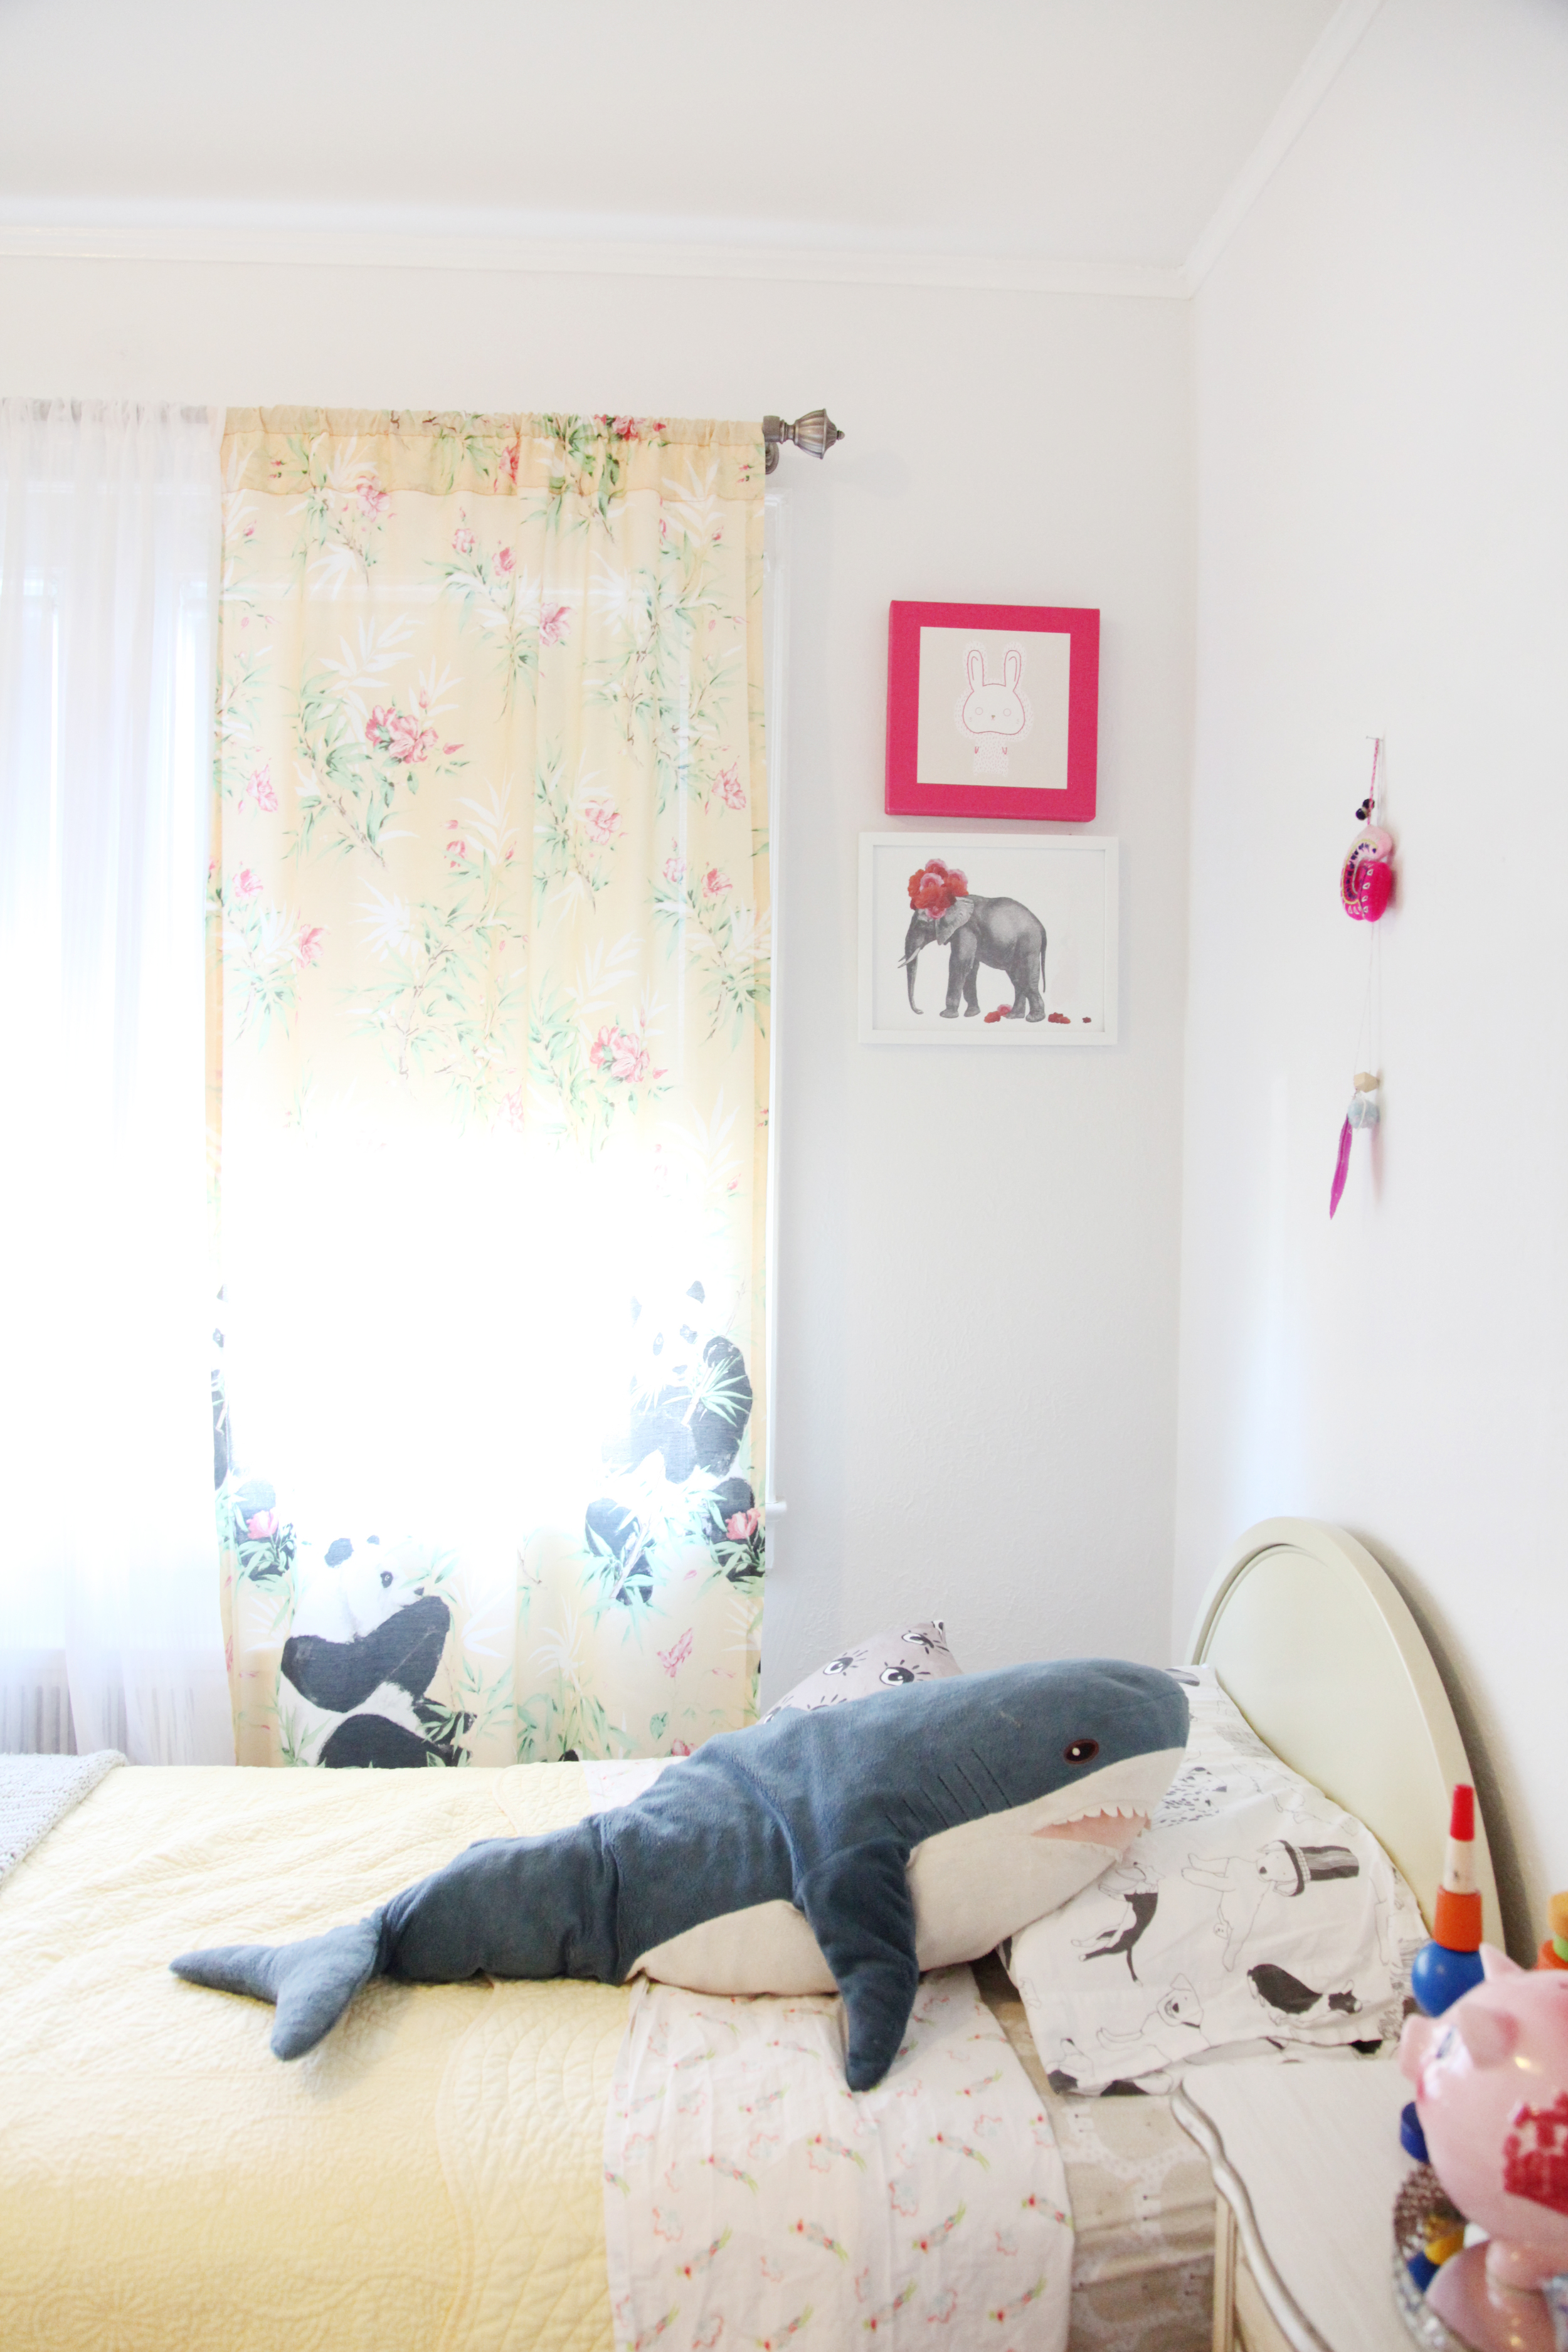 Rummage-sale panda curtains (!!), party favor decor, and a cozy shark.